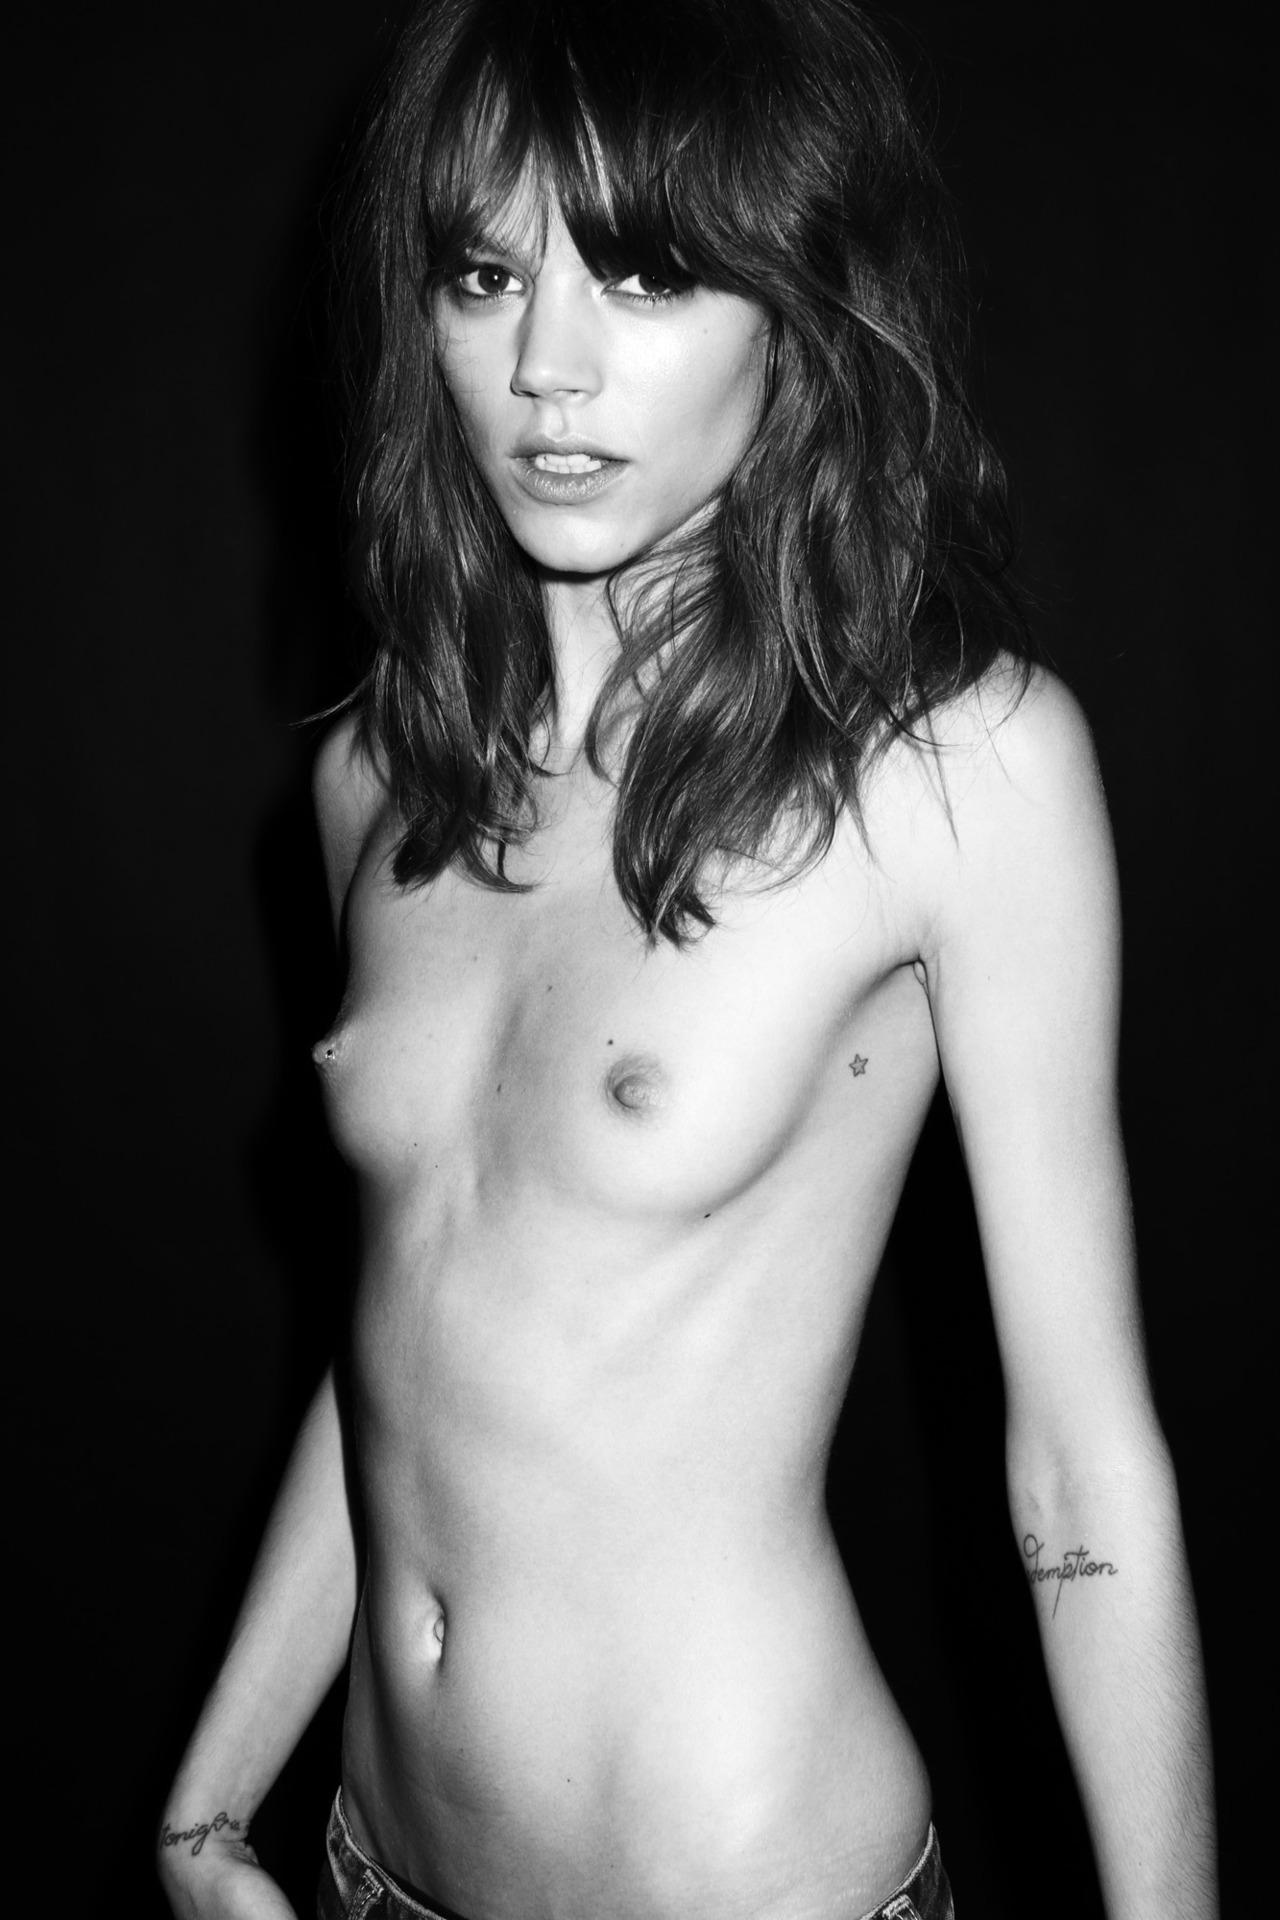 Congratulate, seems Actress linda kelsey posing nude